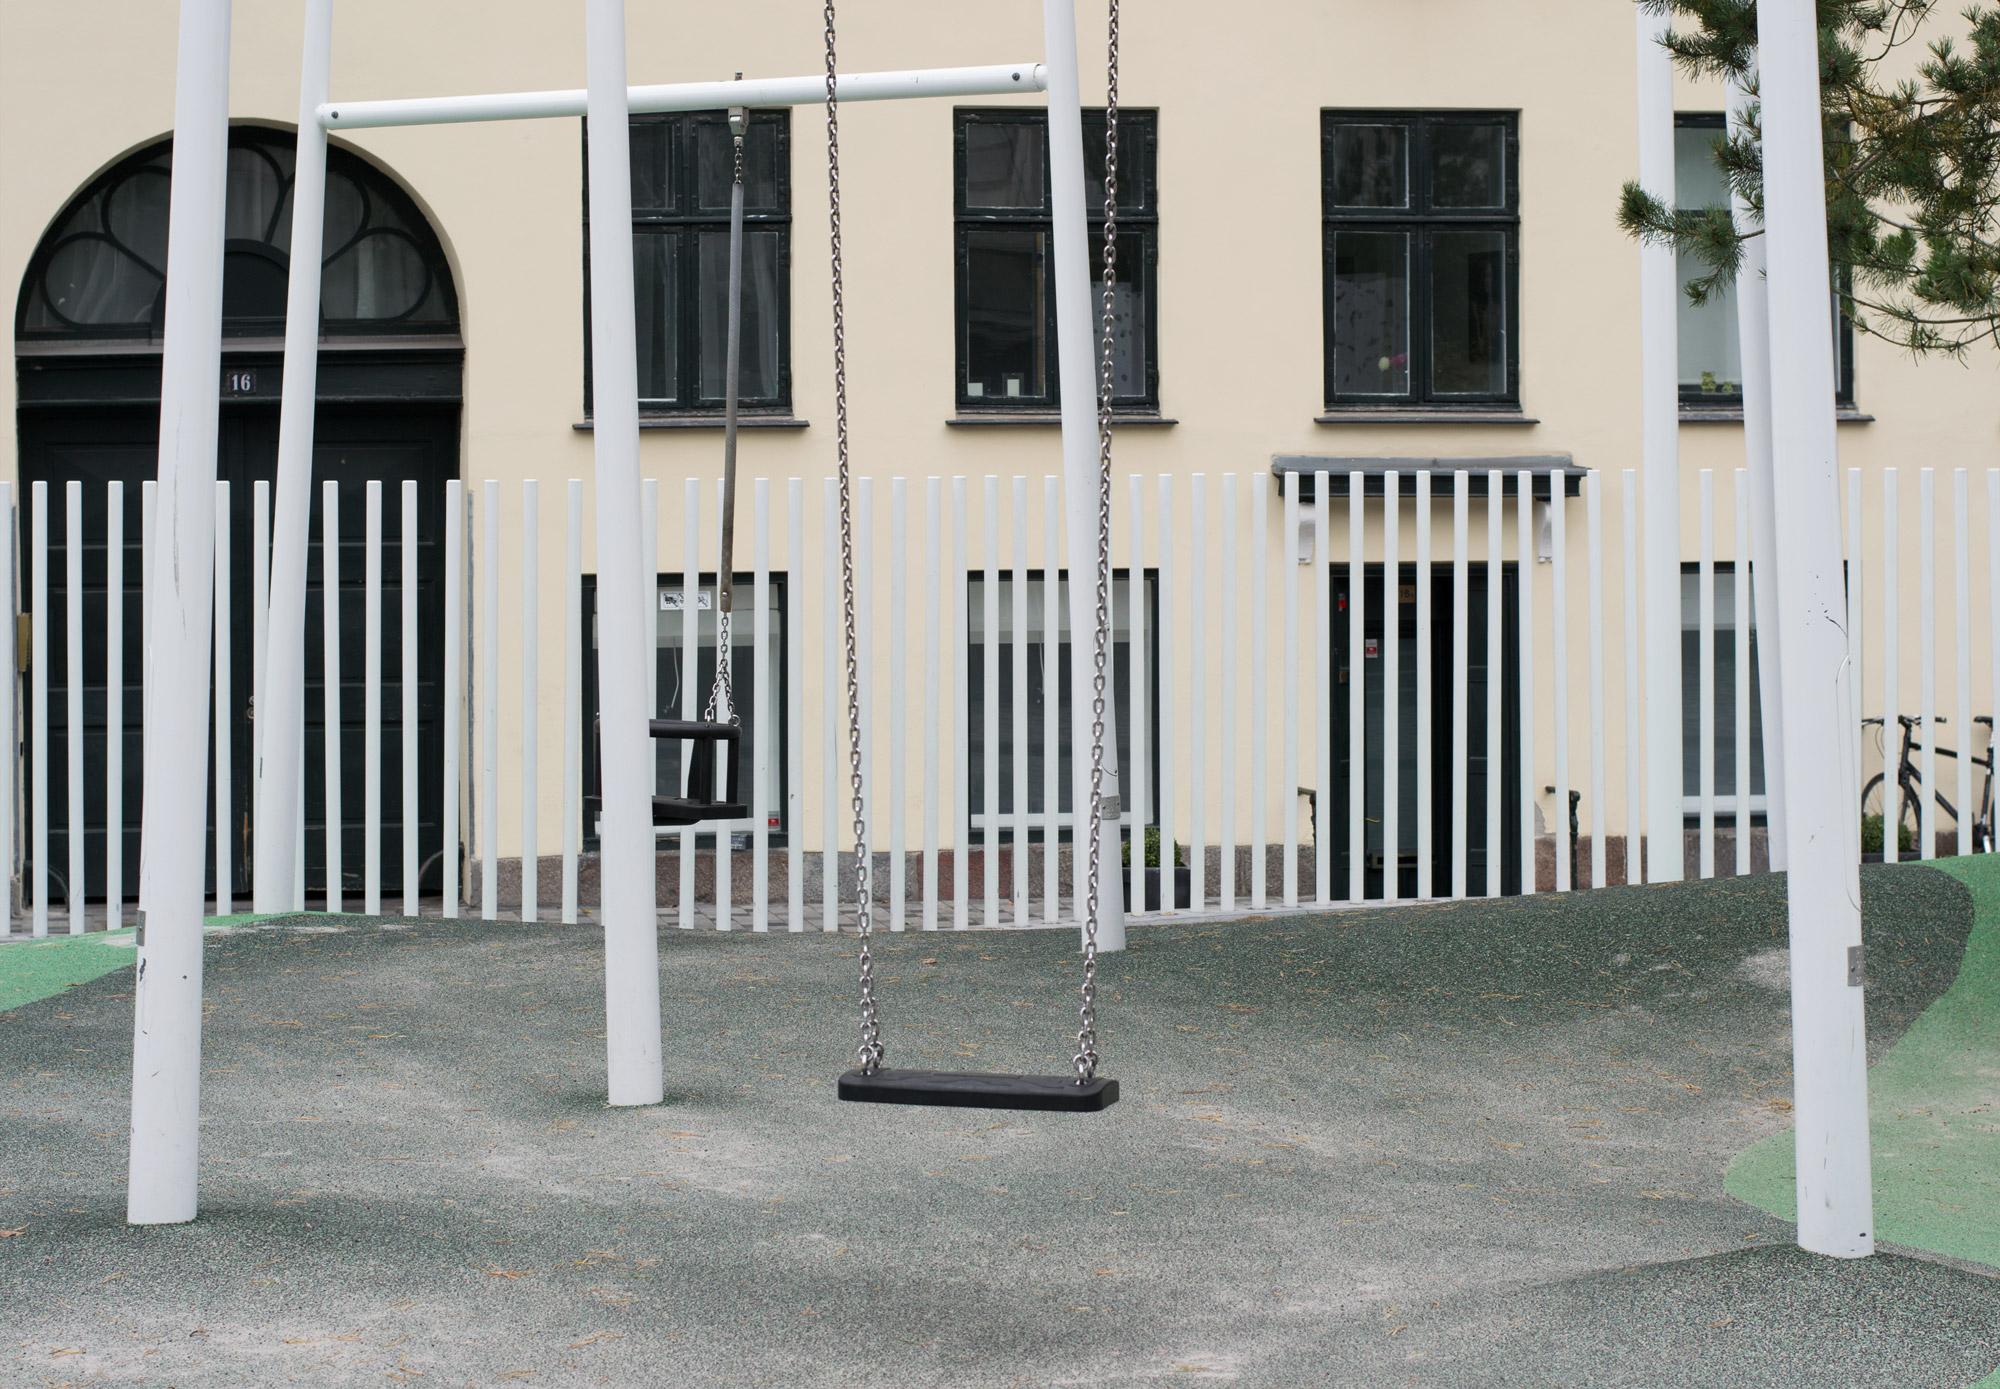 urbanbacklog-copenhagen-hauser-plads-1.jpg